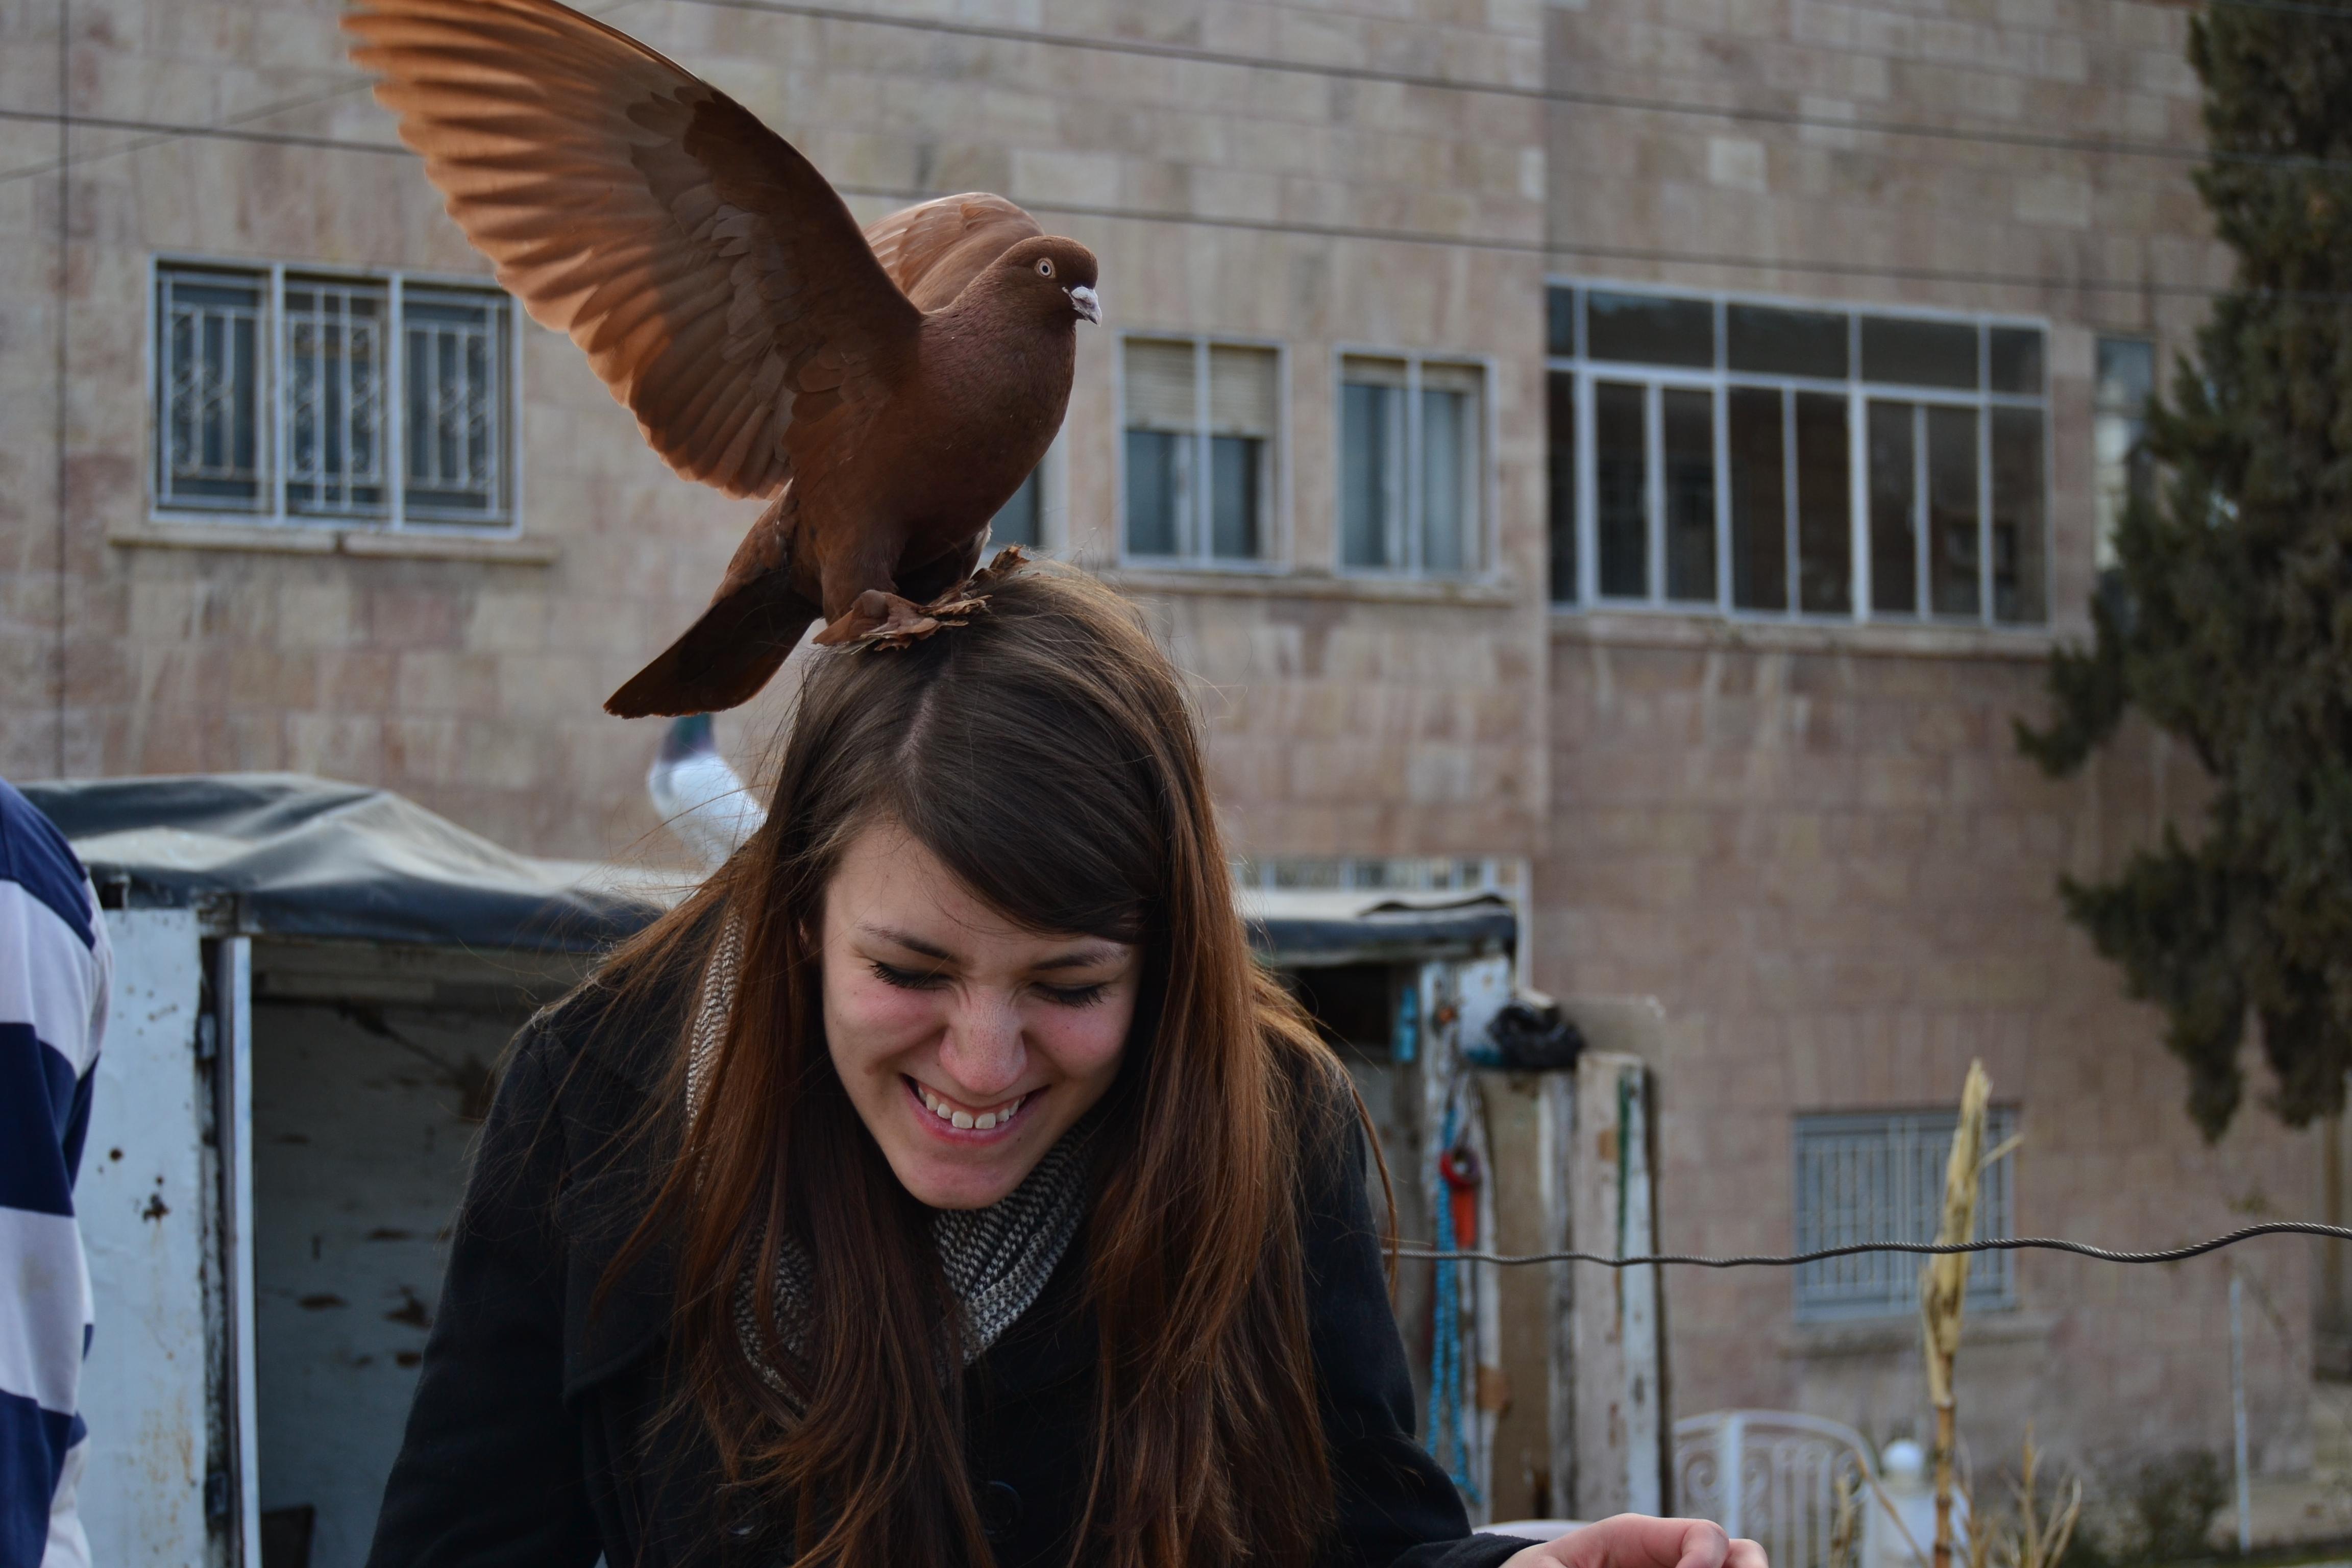 pigeon landing on head isa study abroad student blog